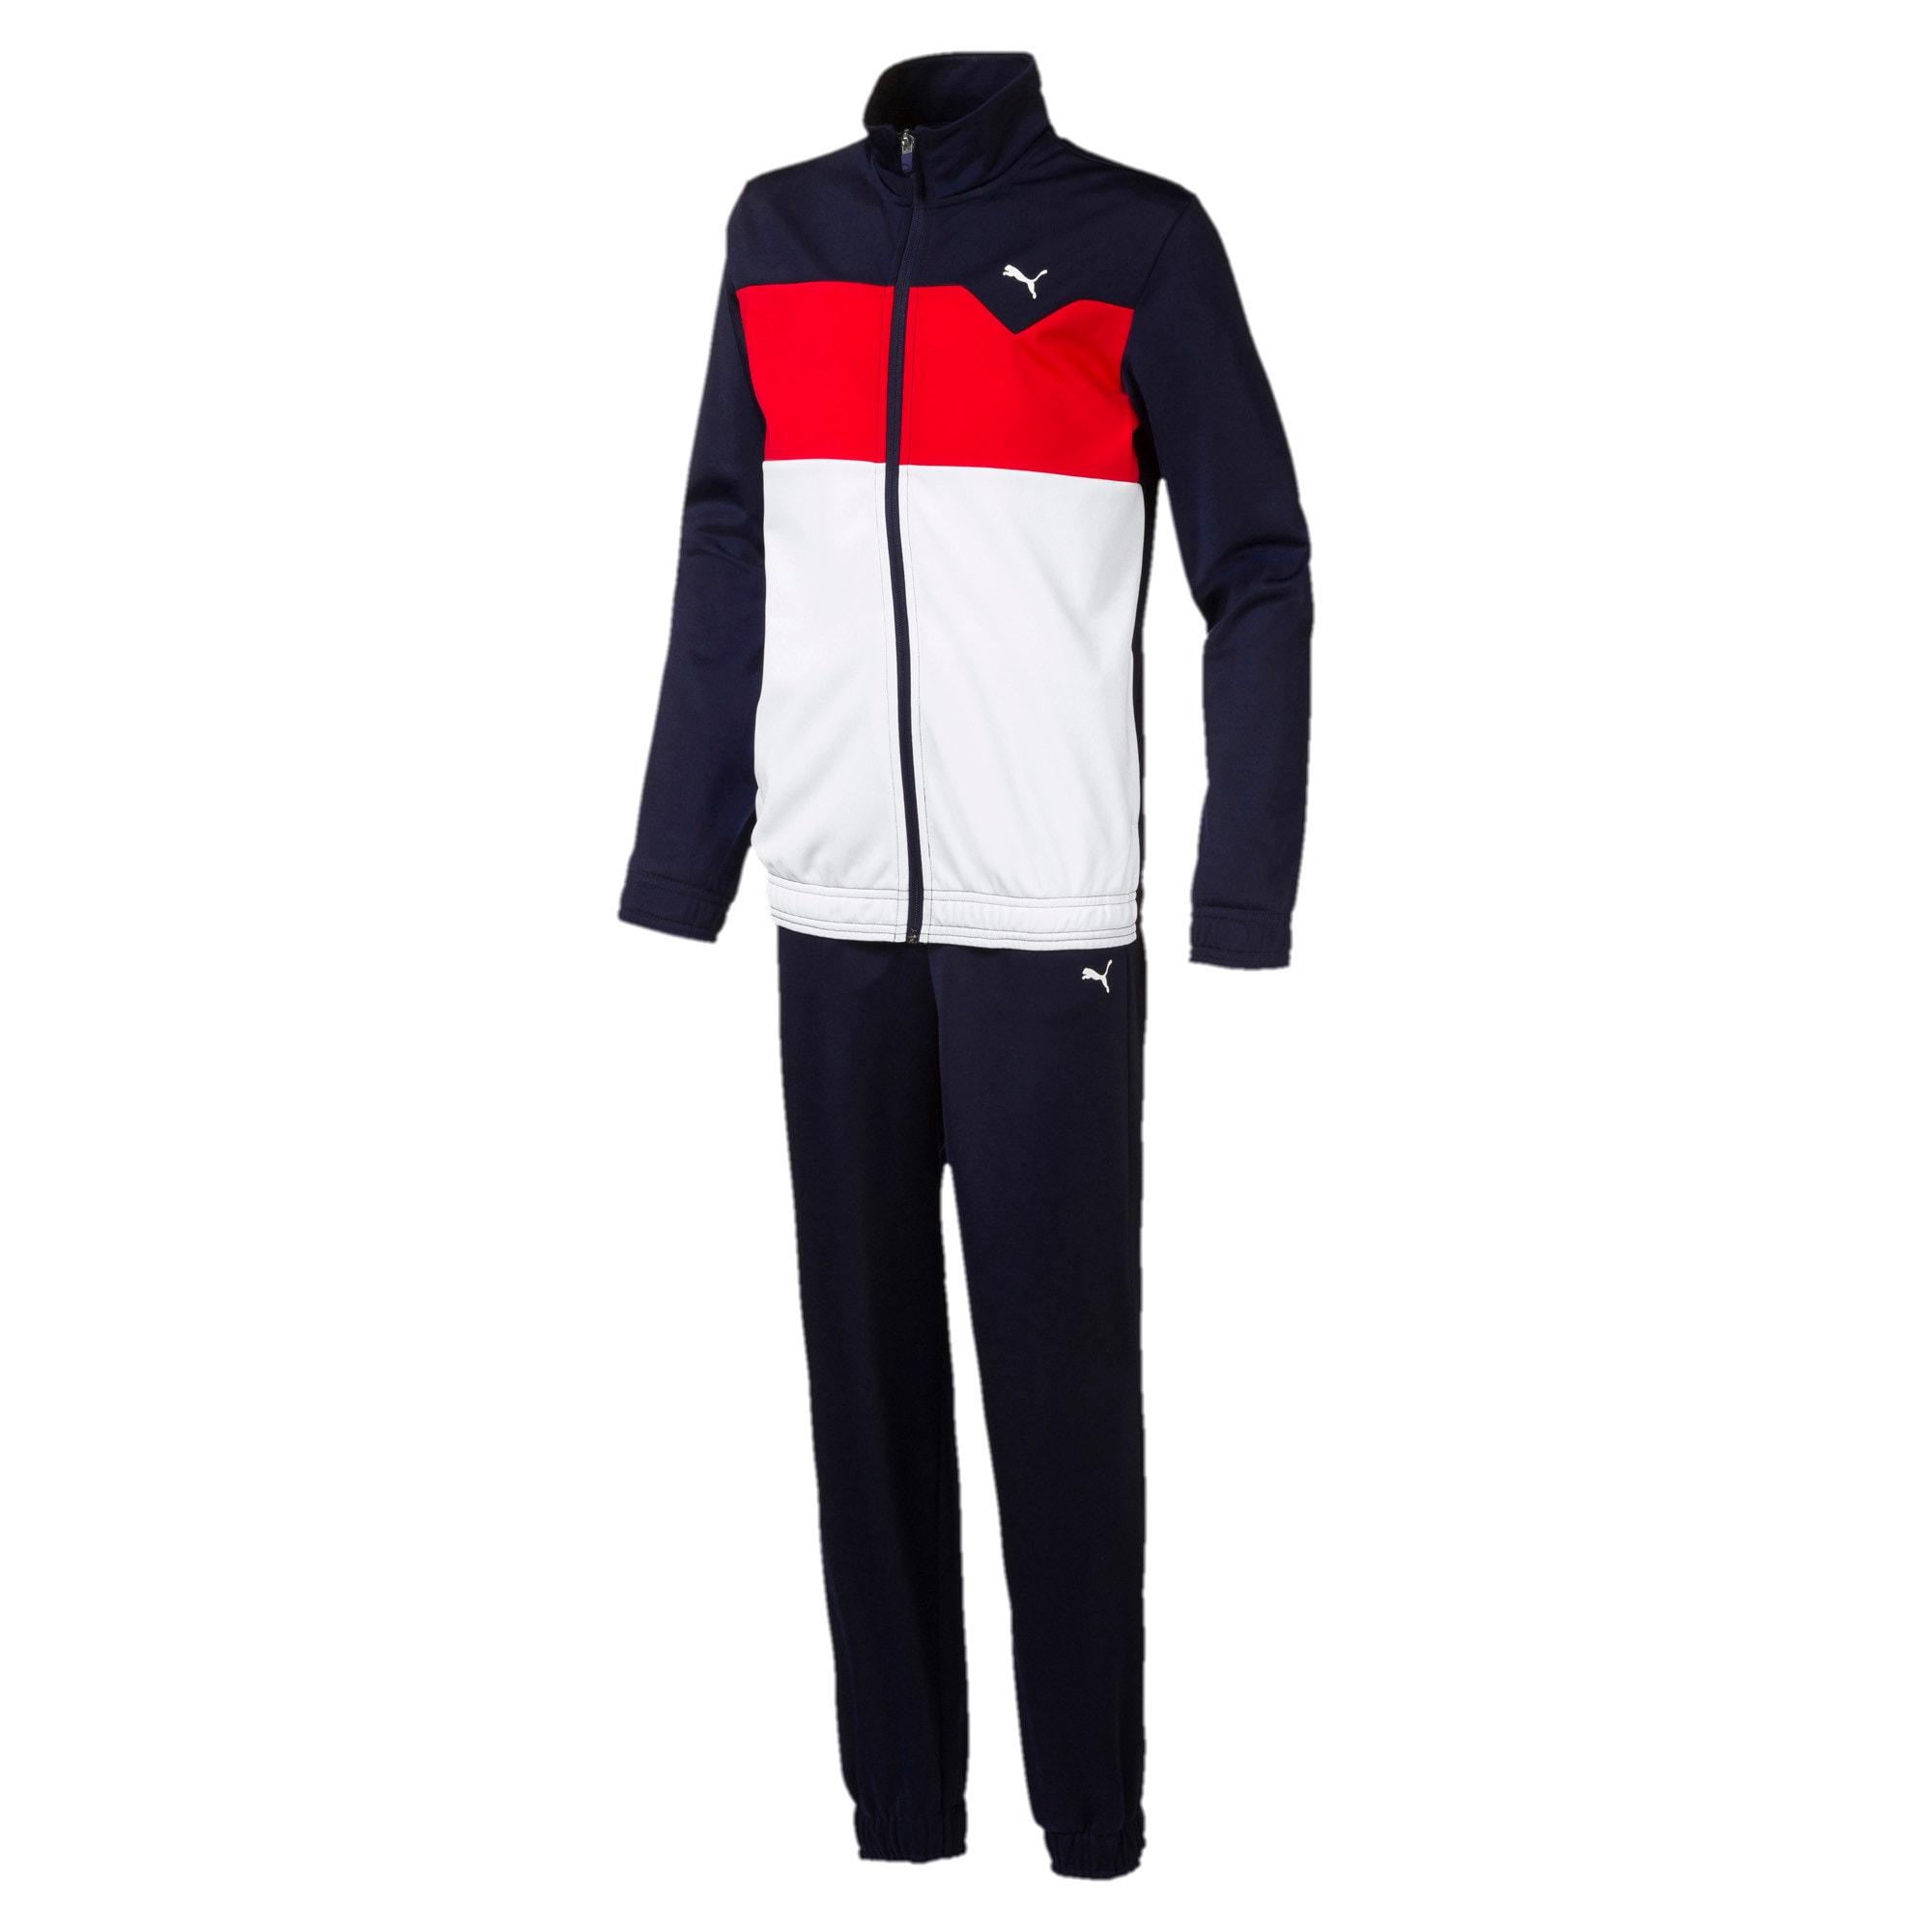 Tricot Suit I B Peacoat